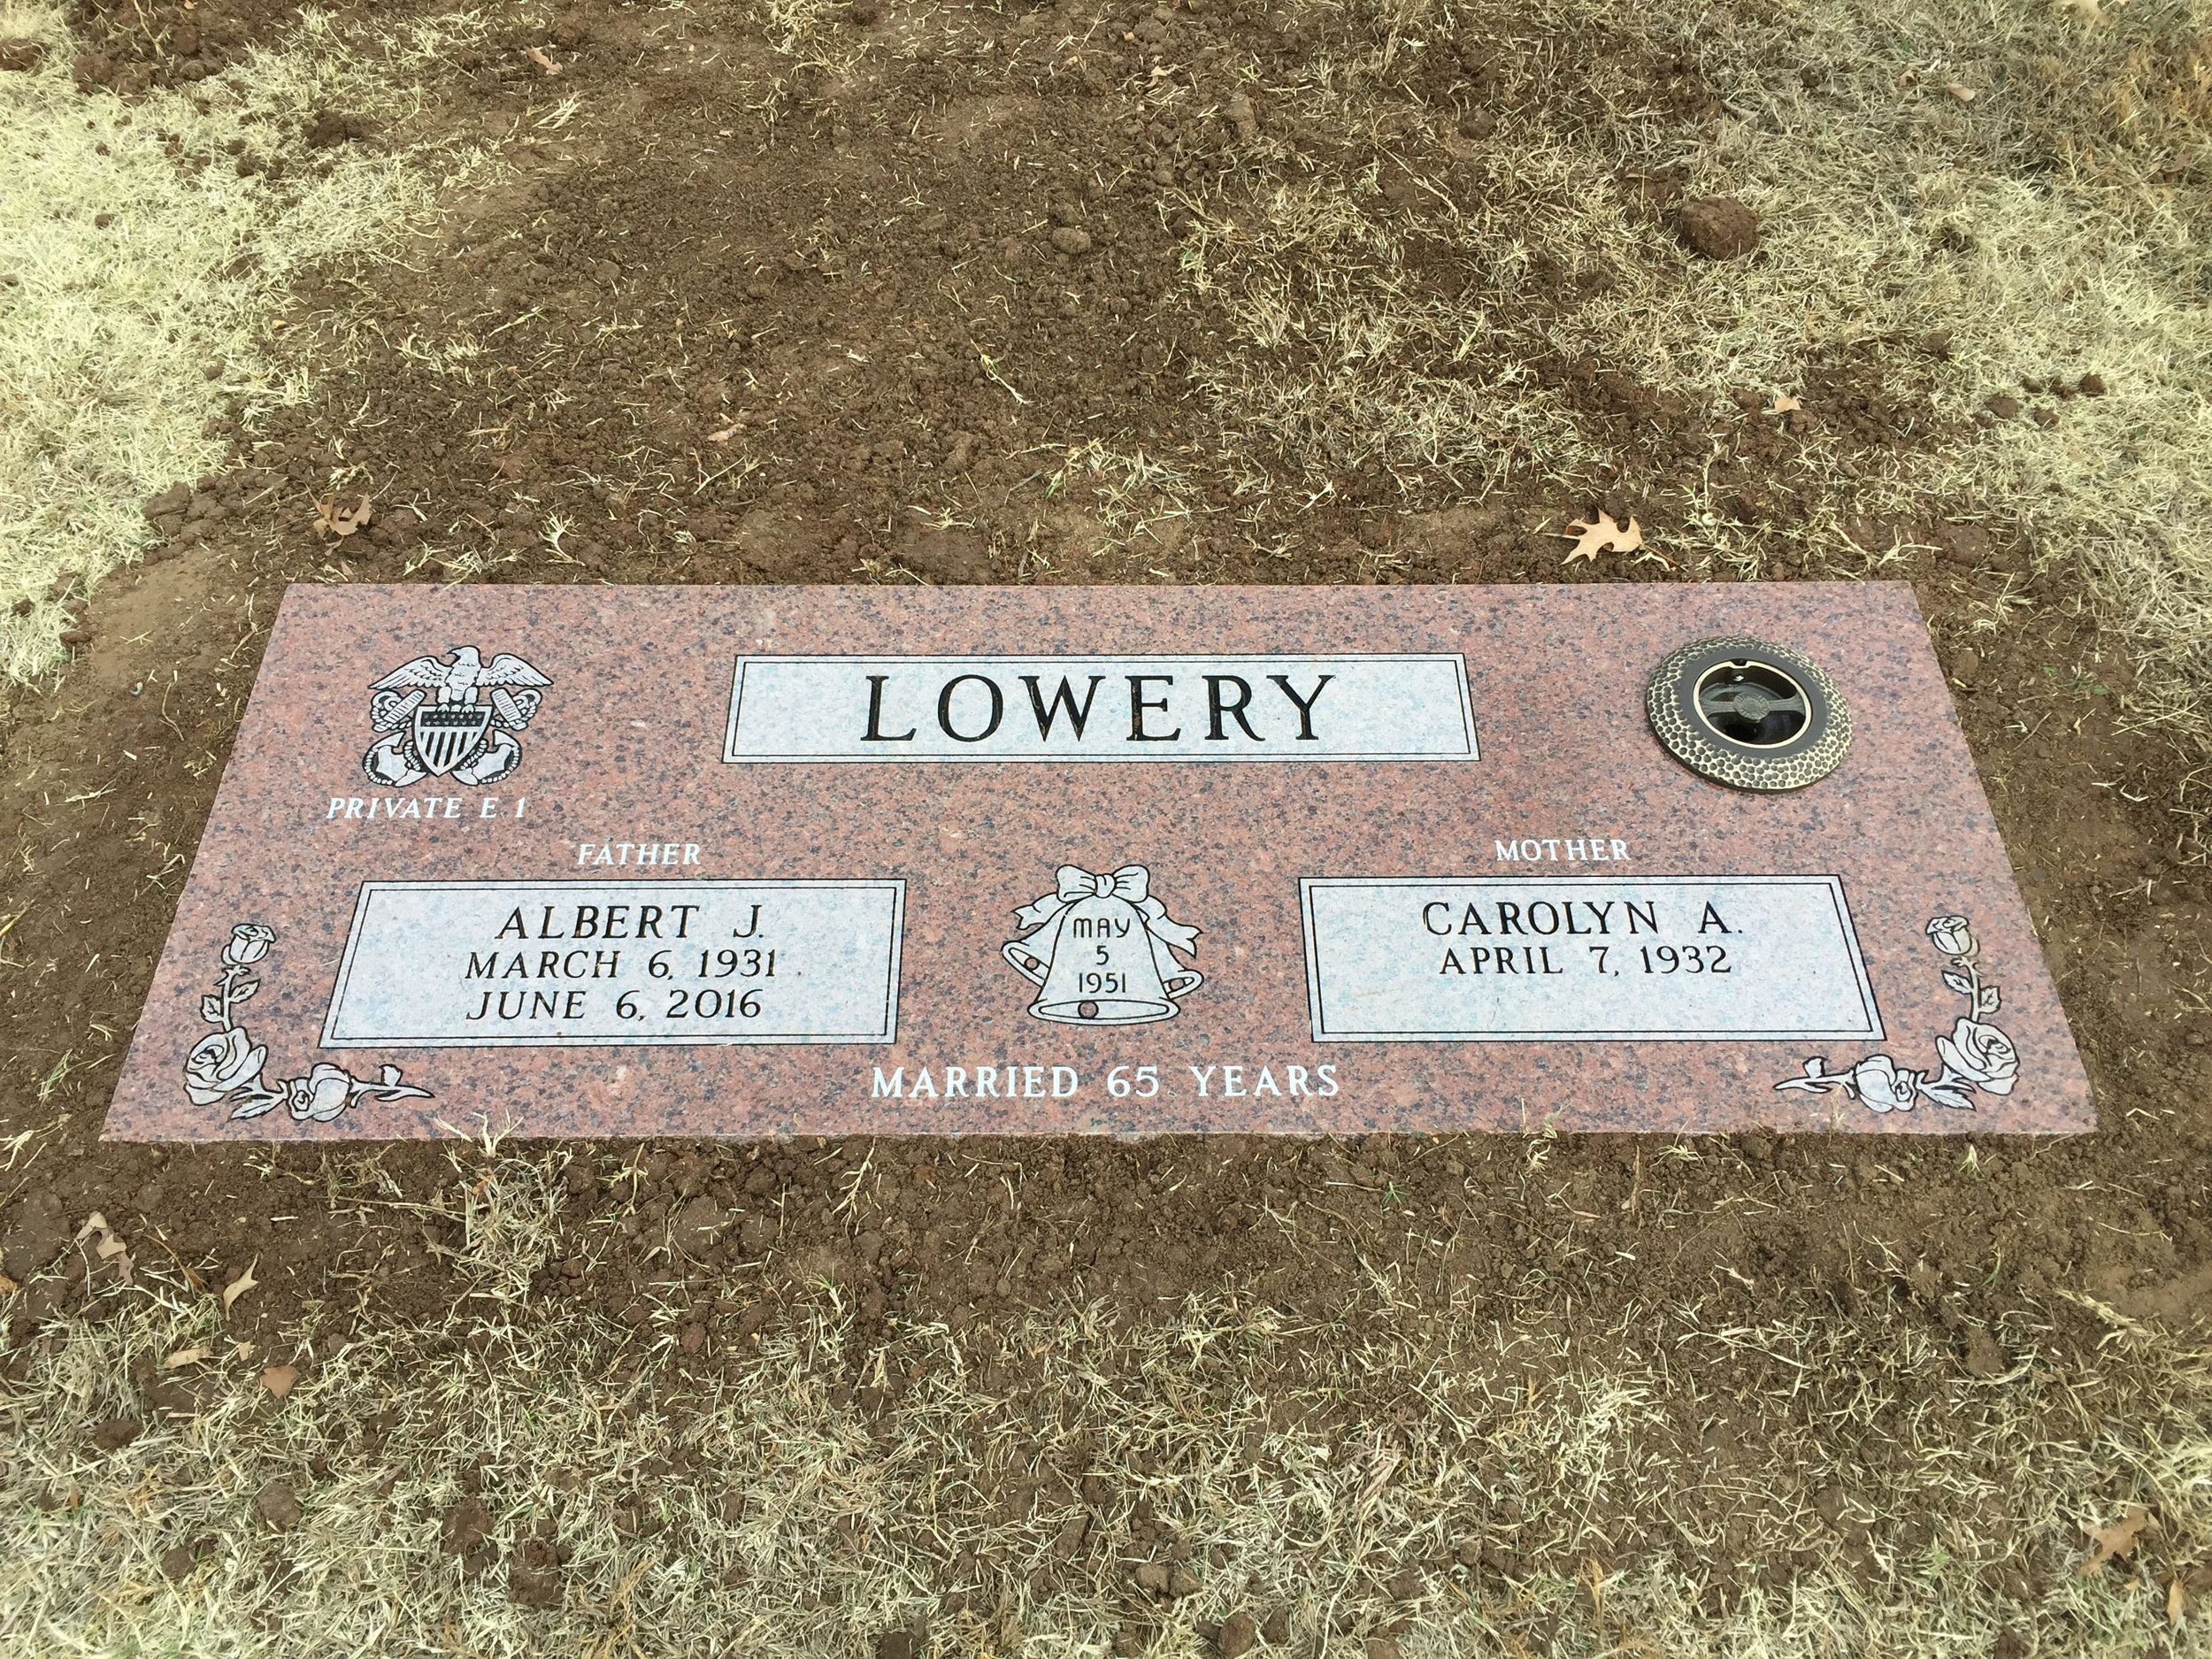 22. Memorial Park Cemetery